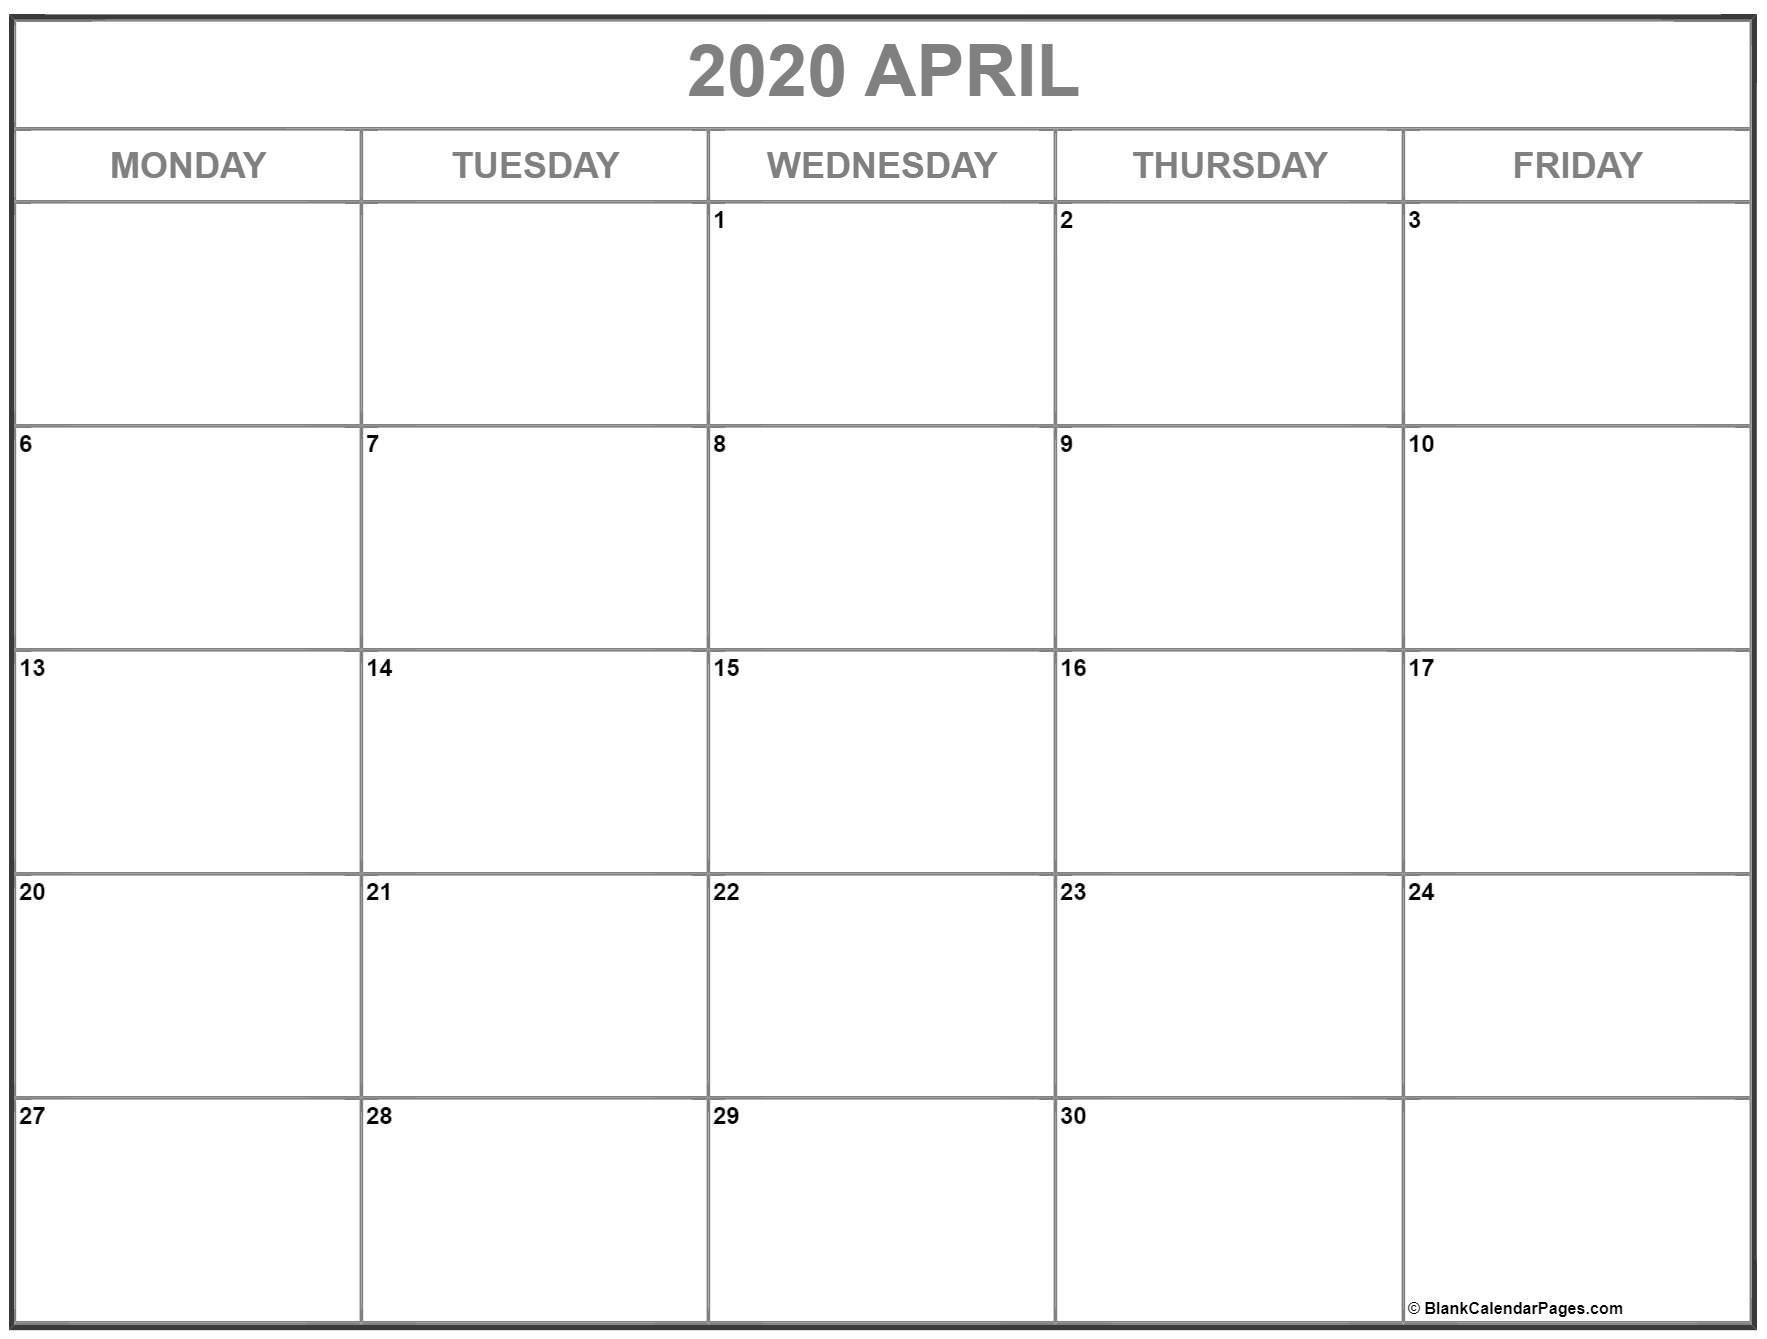 April 2020 Monday Calendar | Monday To Sunday Calendar Monday To Friday